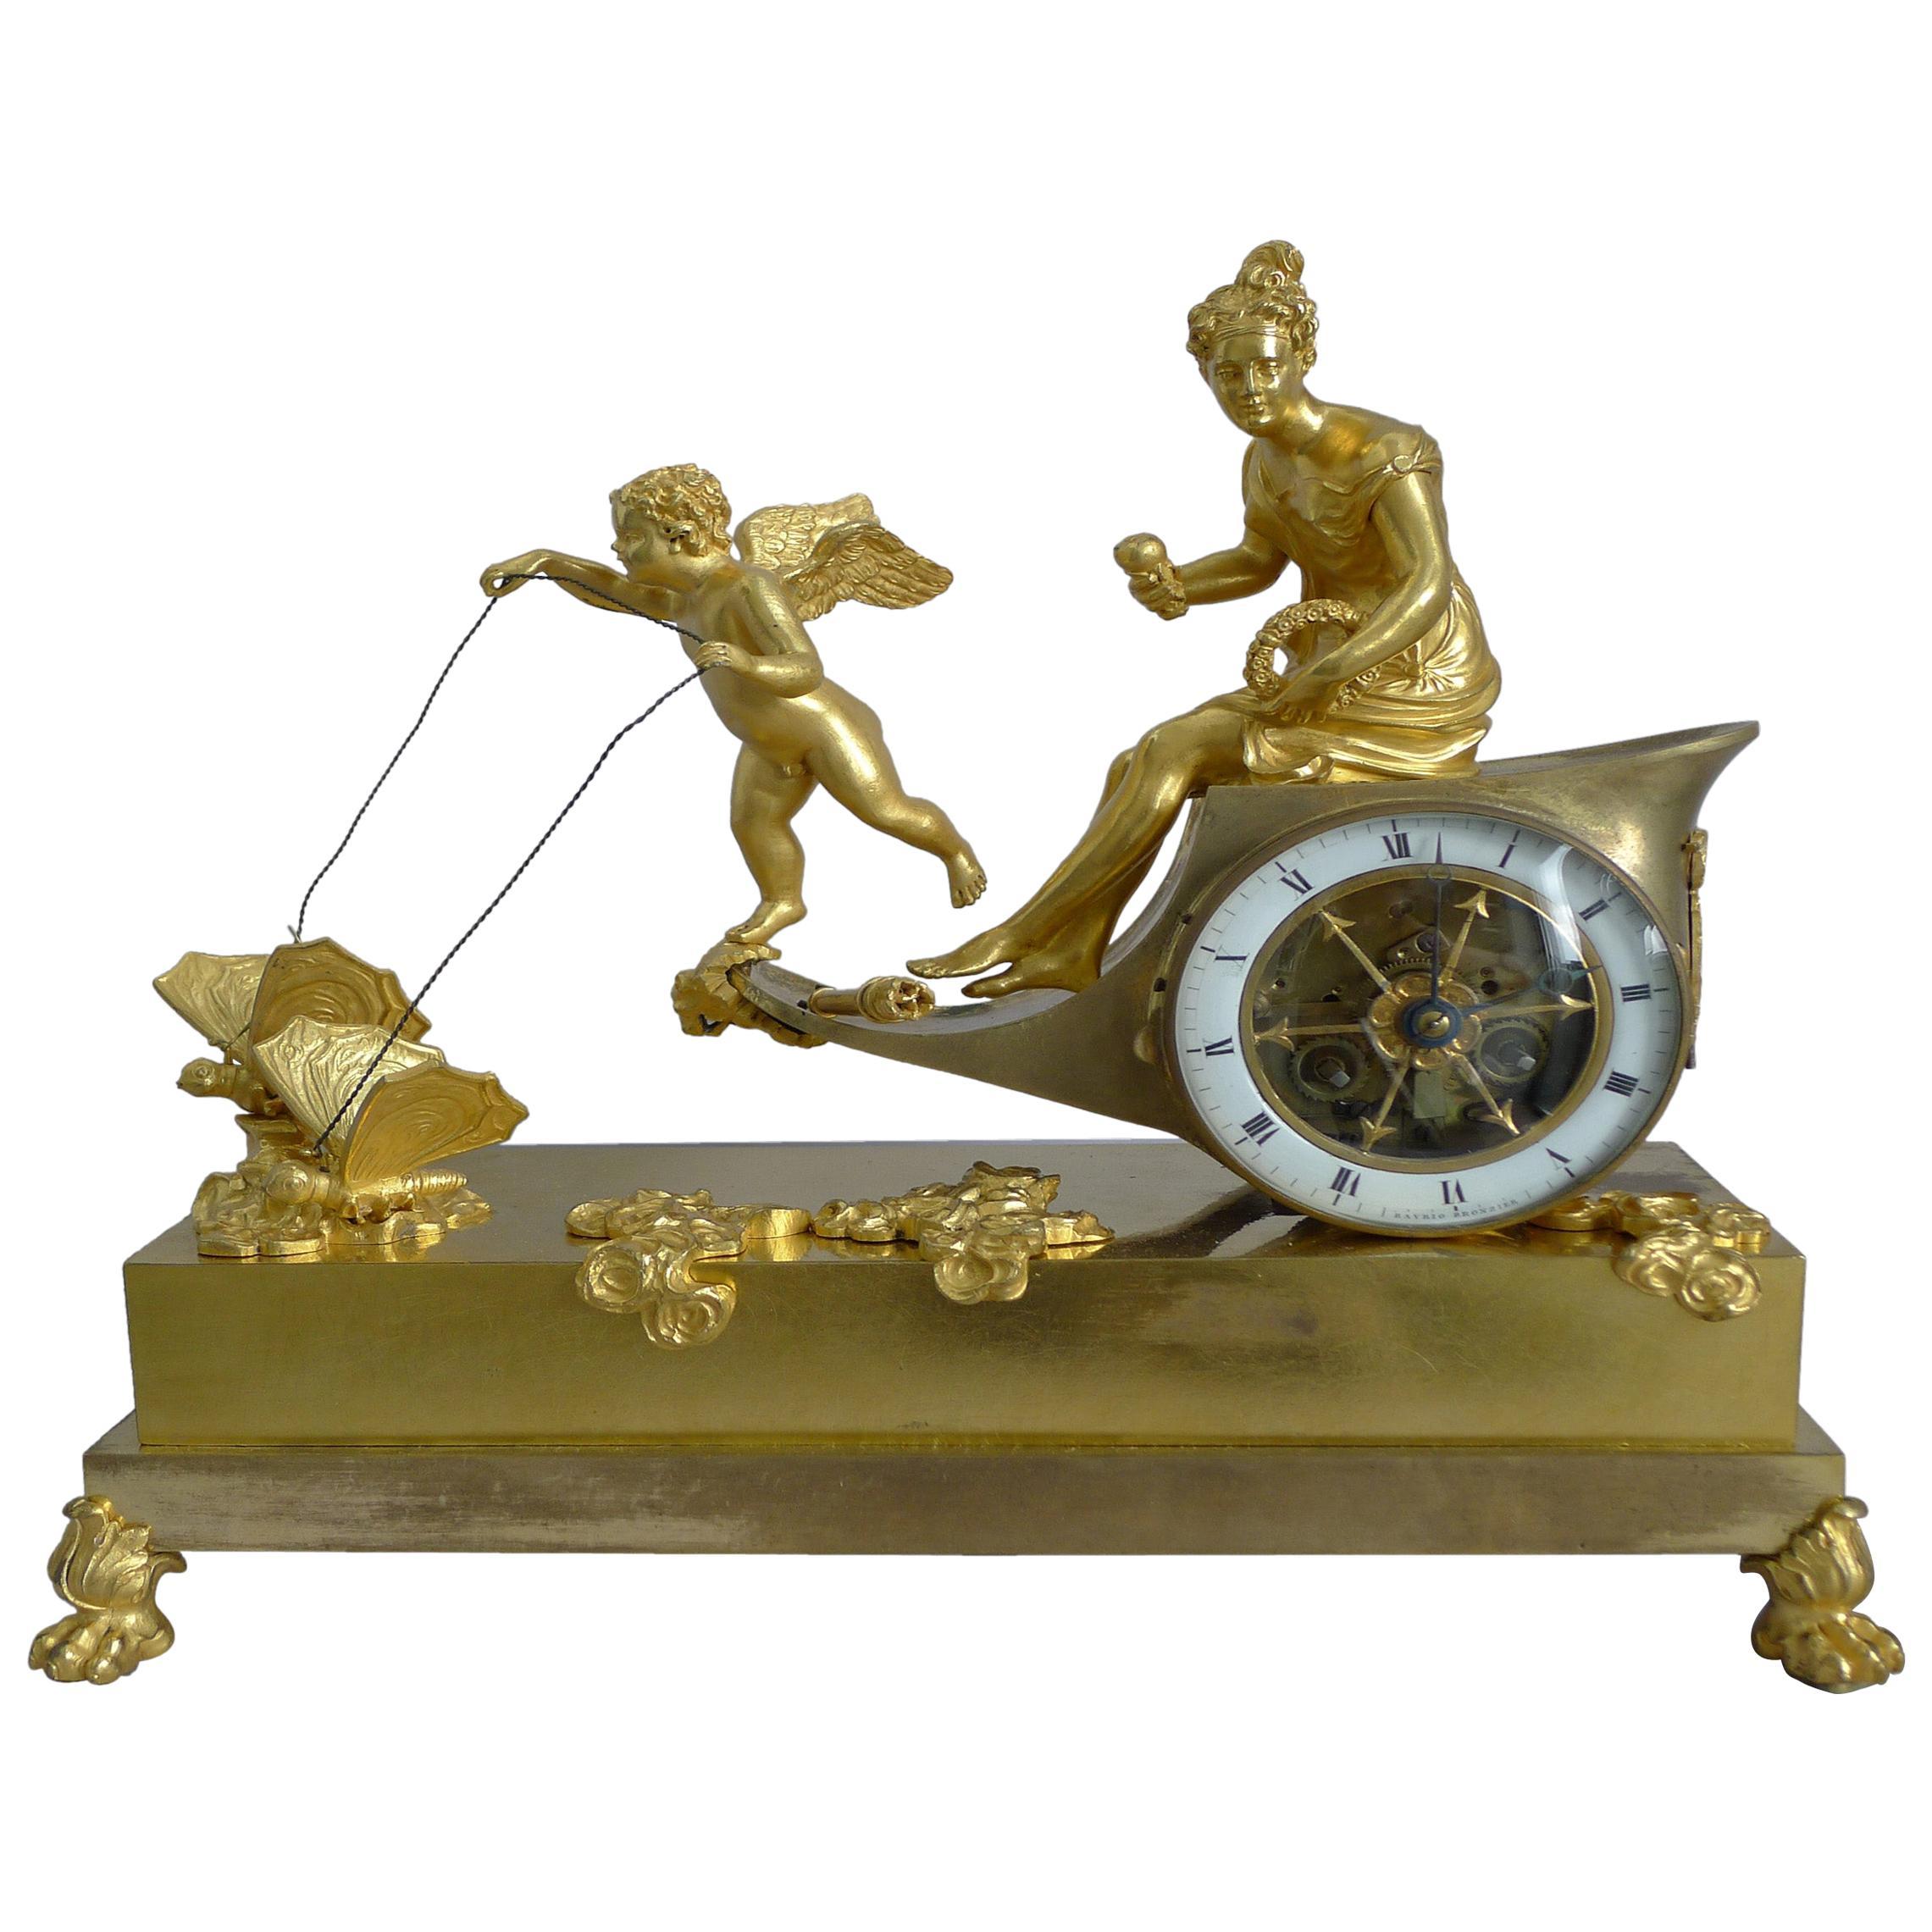 French Empire Ormolu Chariot Clock Signed Ravrio